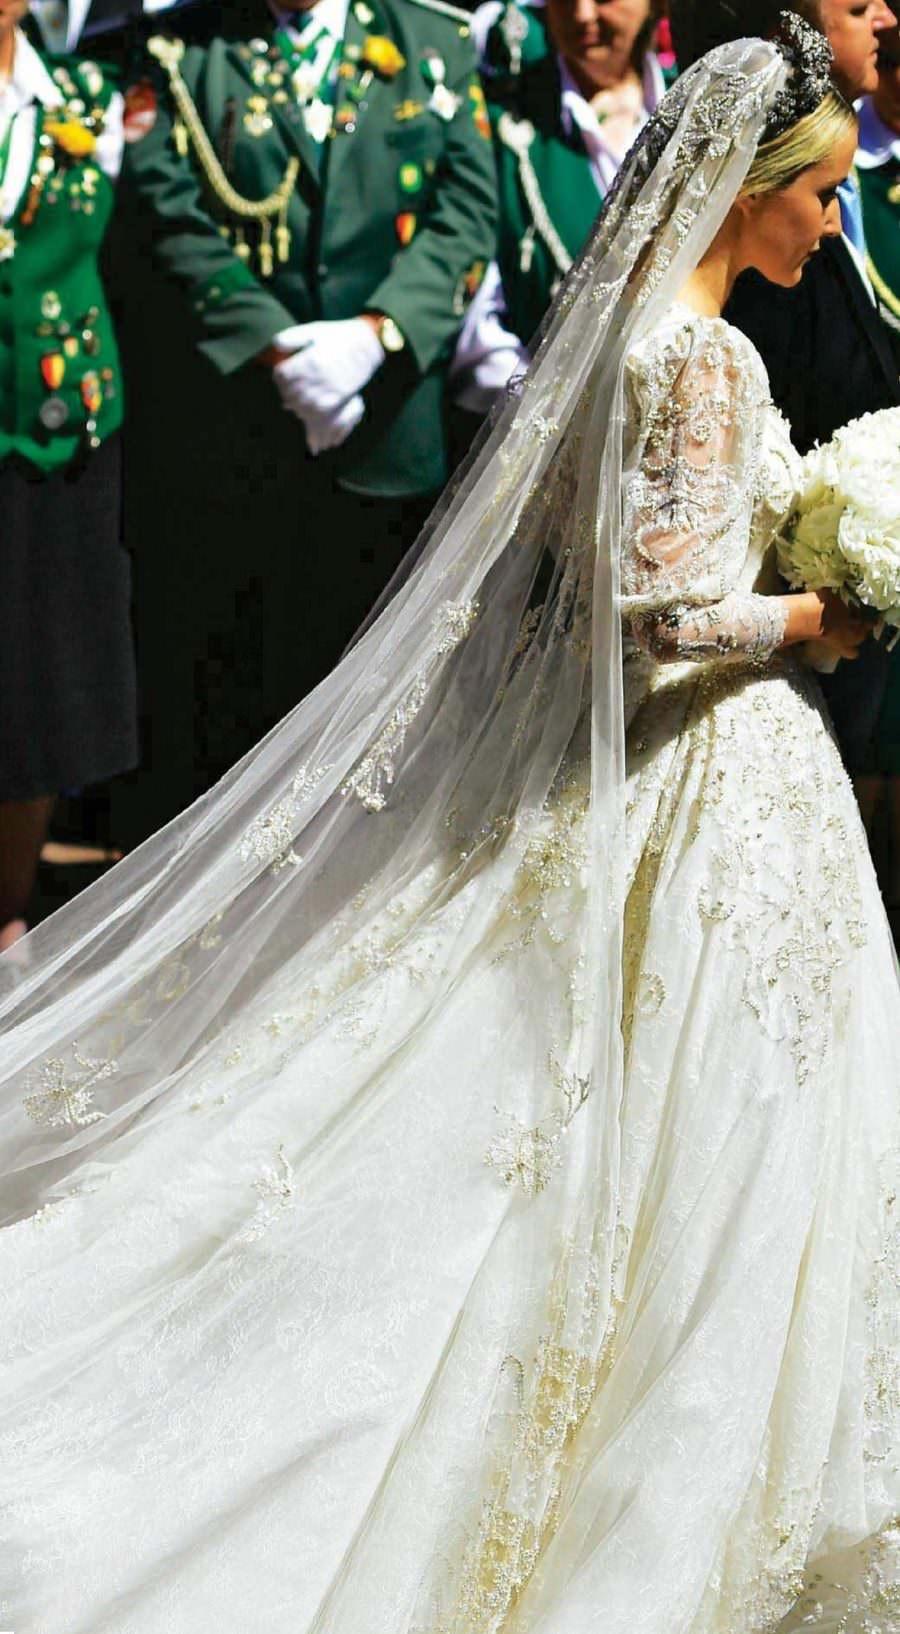 In A Fairytale Wedding Full Of Splendour Prince Ernst August Of Hanover